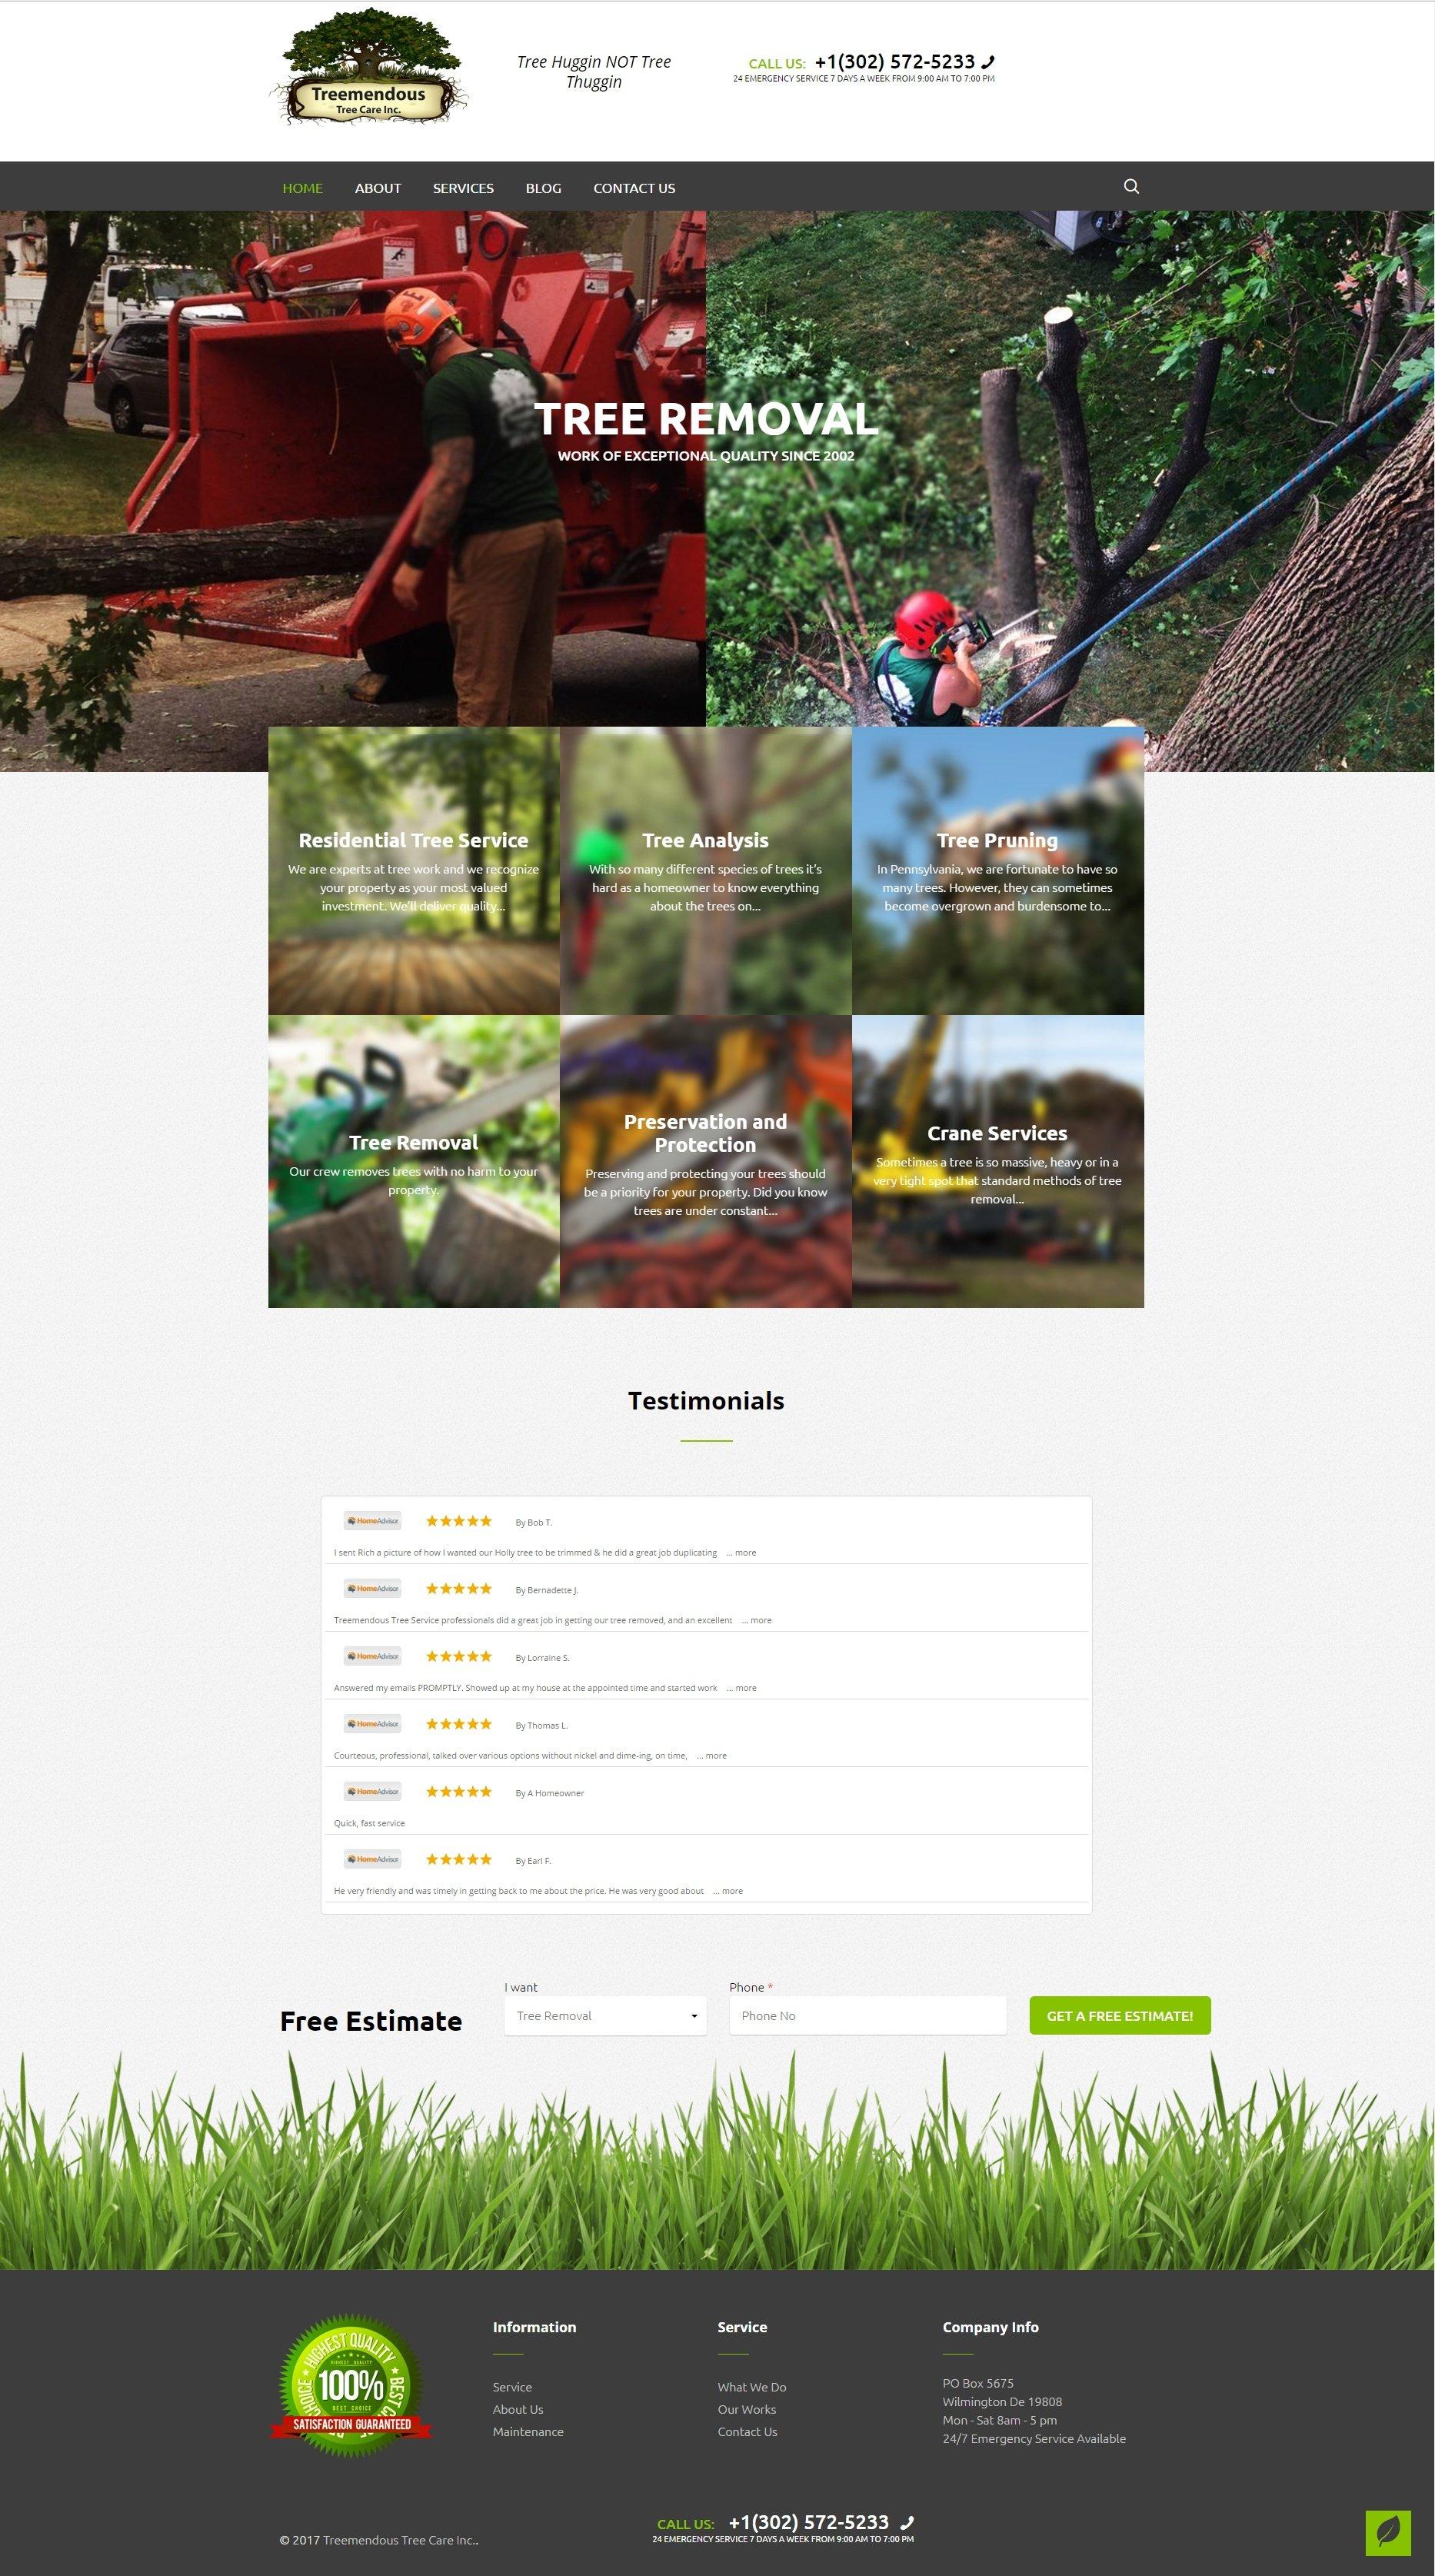 Tree Service Website Development - Treemendous Tree Services Lite.jpg